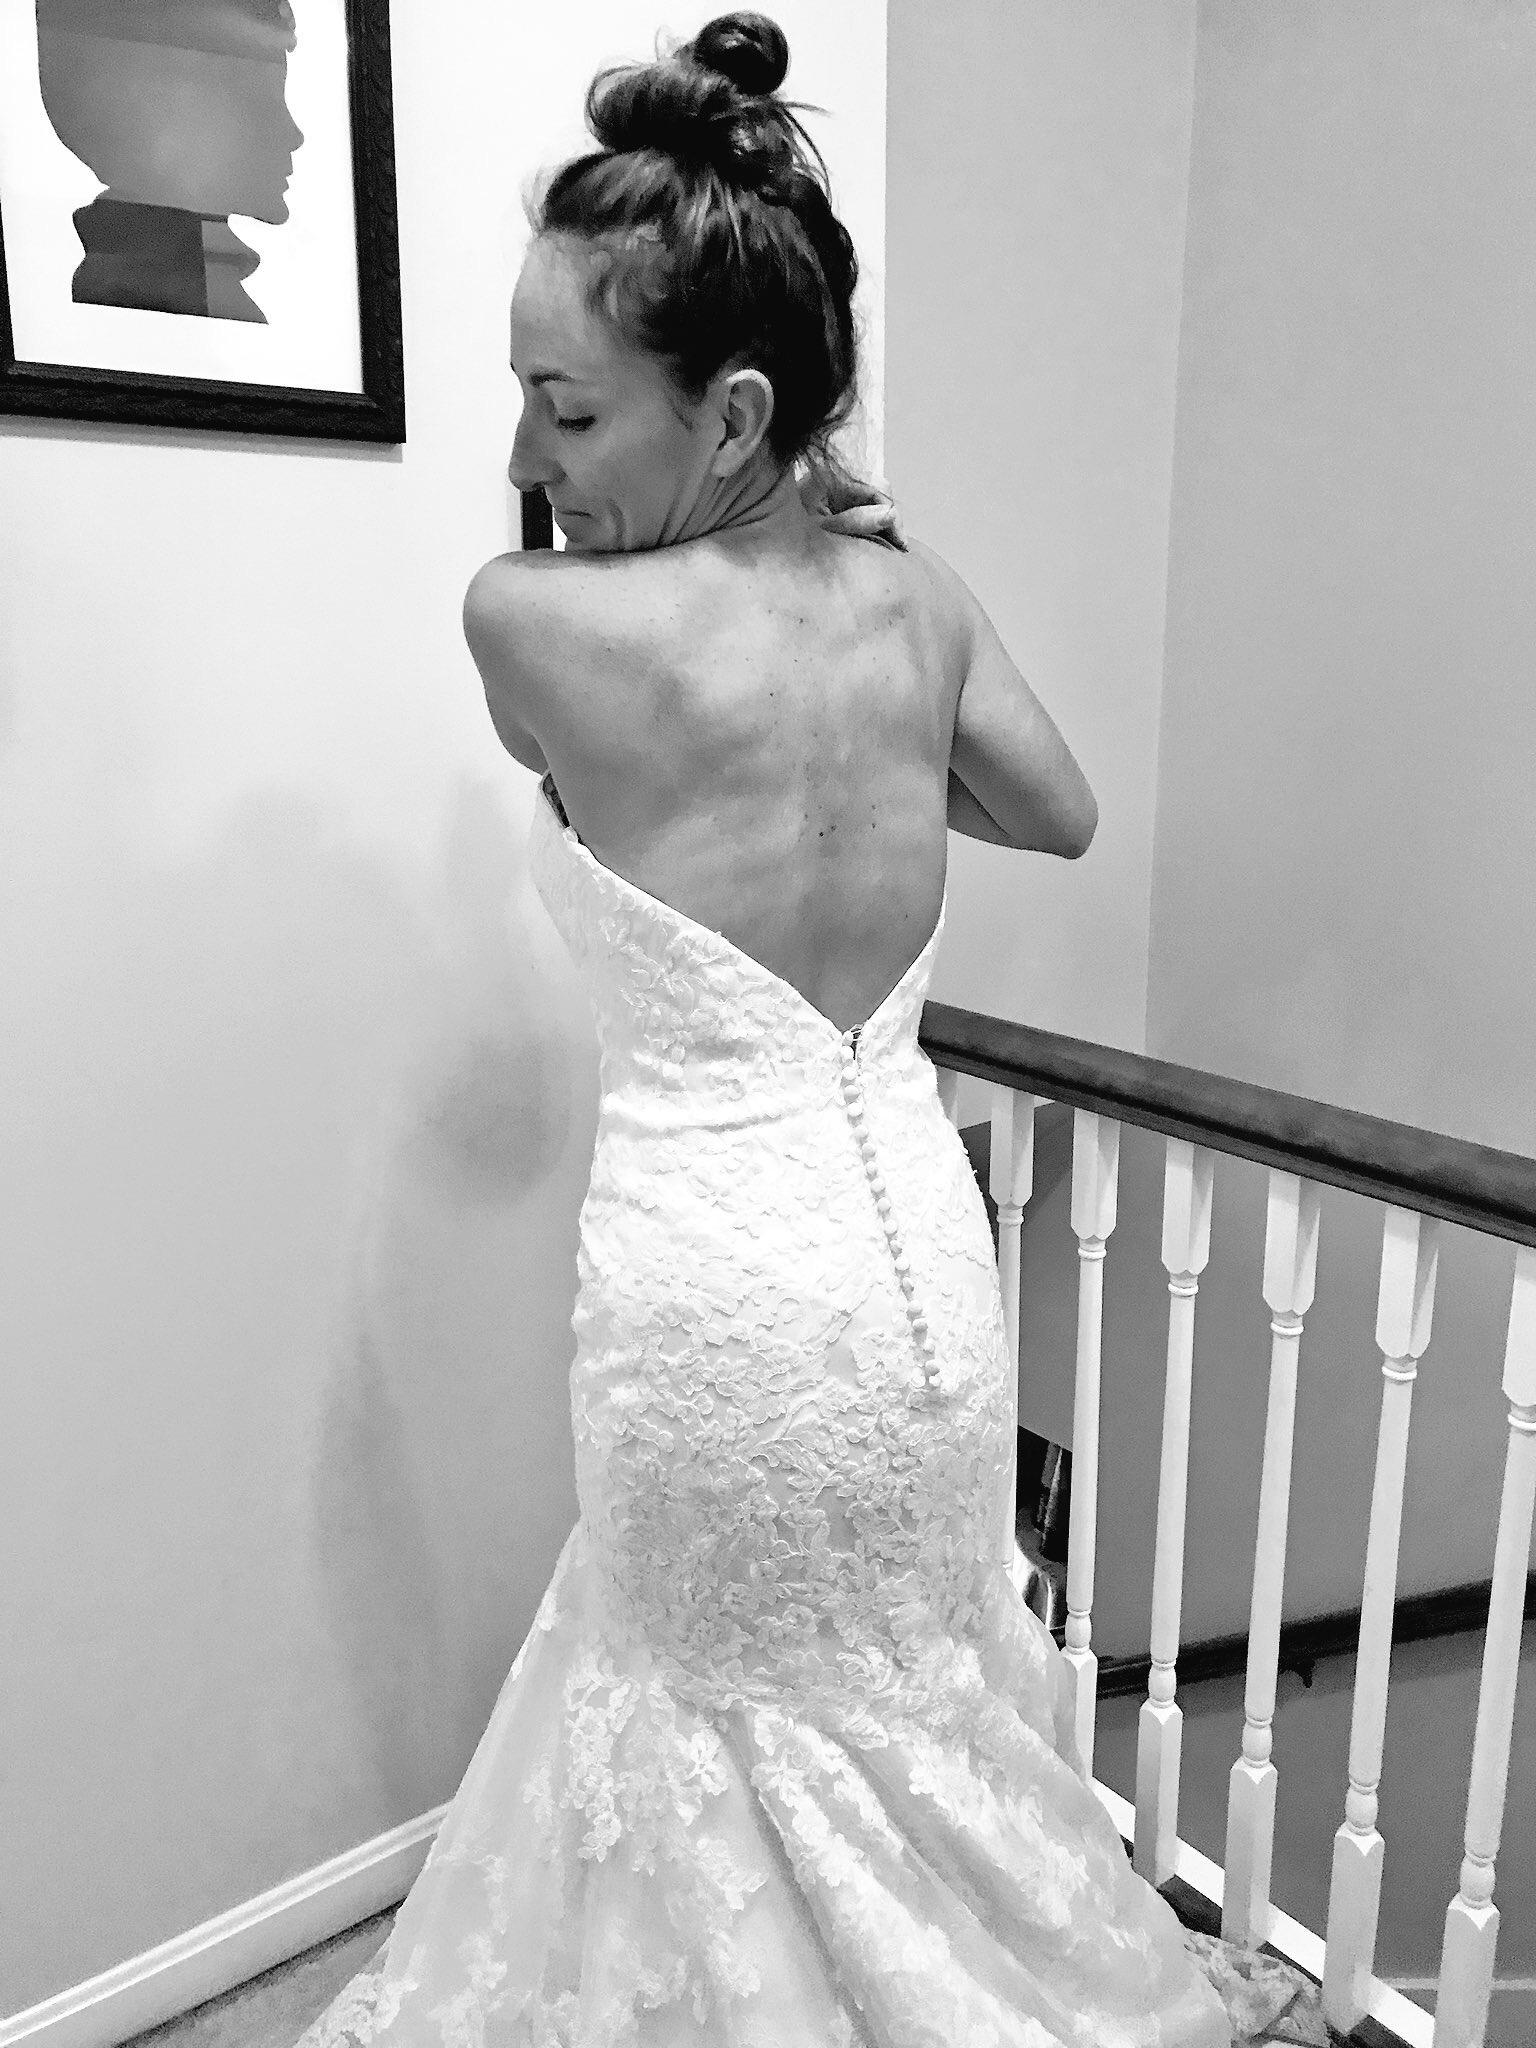 Wedding Dress - Wedding Dress Selfie - Wedding Gown Photo - Mermaid Wedding Lace Gown - Communikait by Kait Hanson